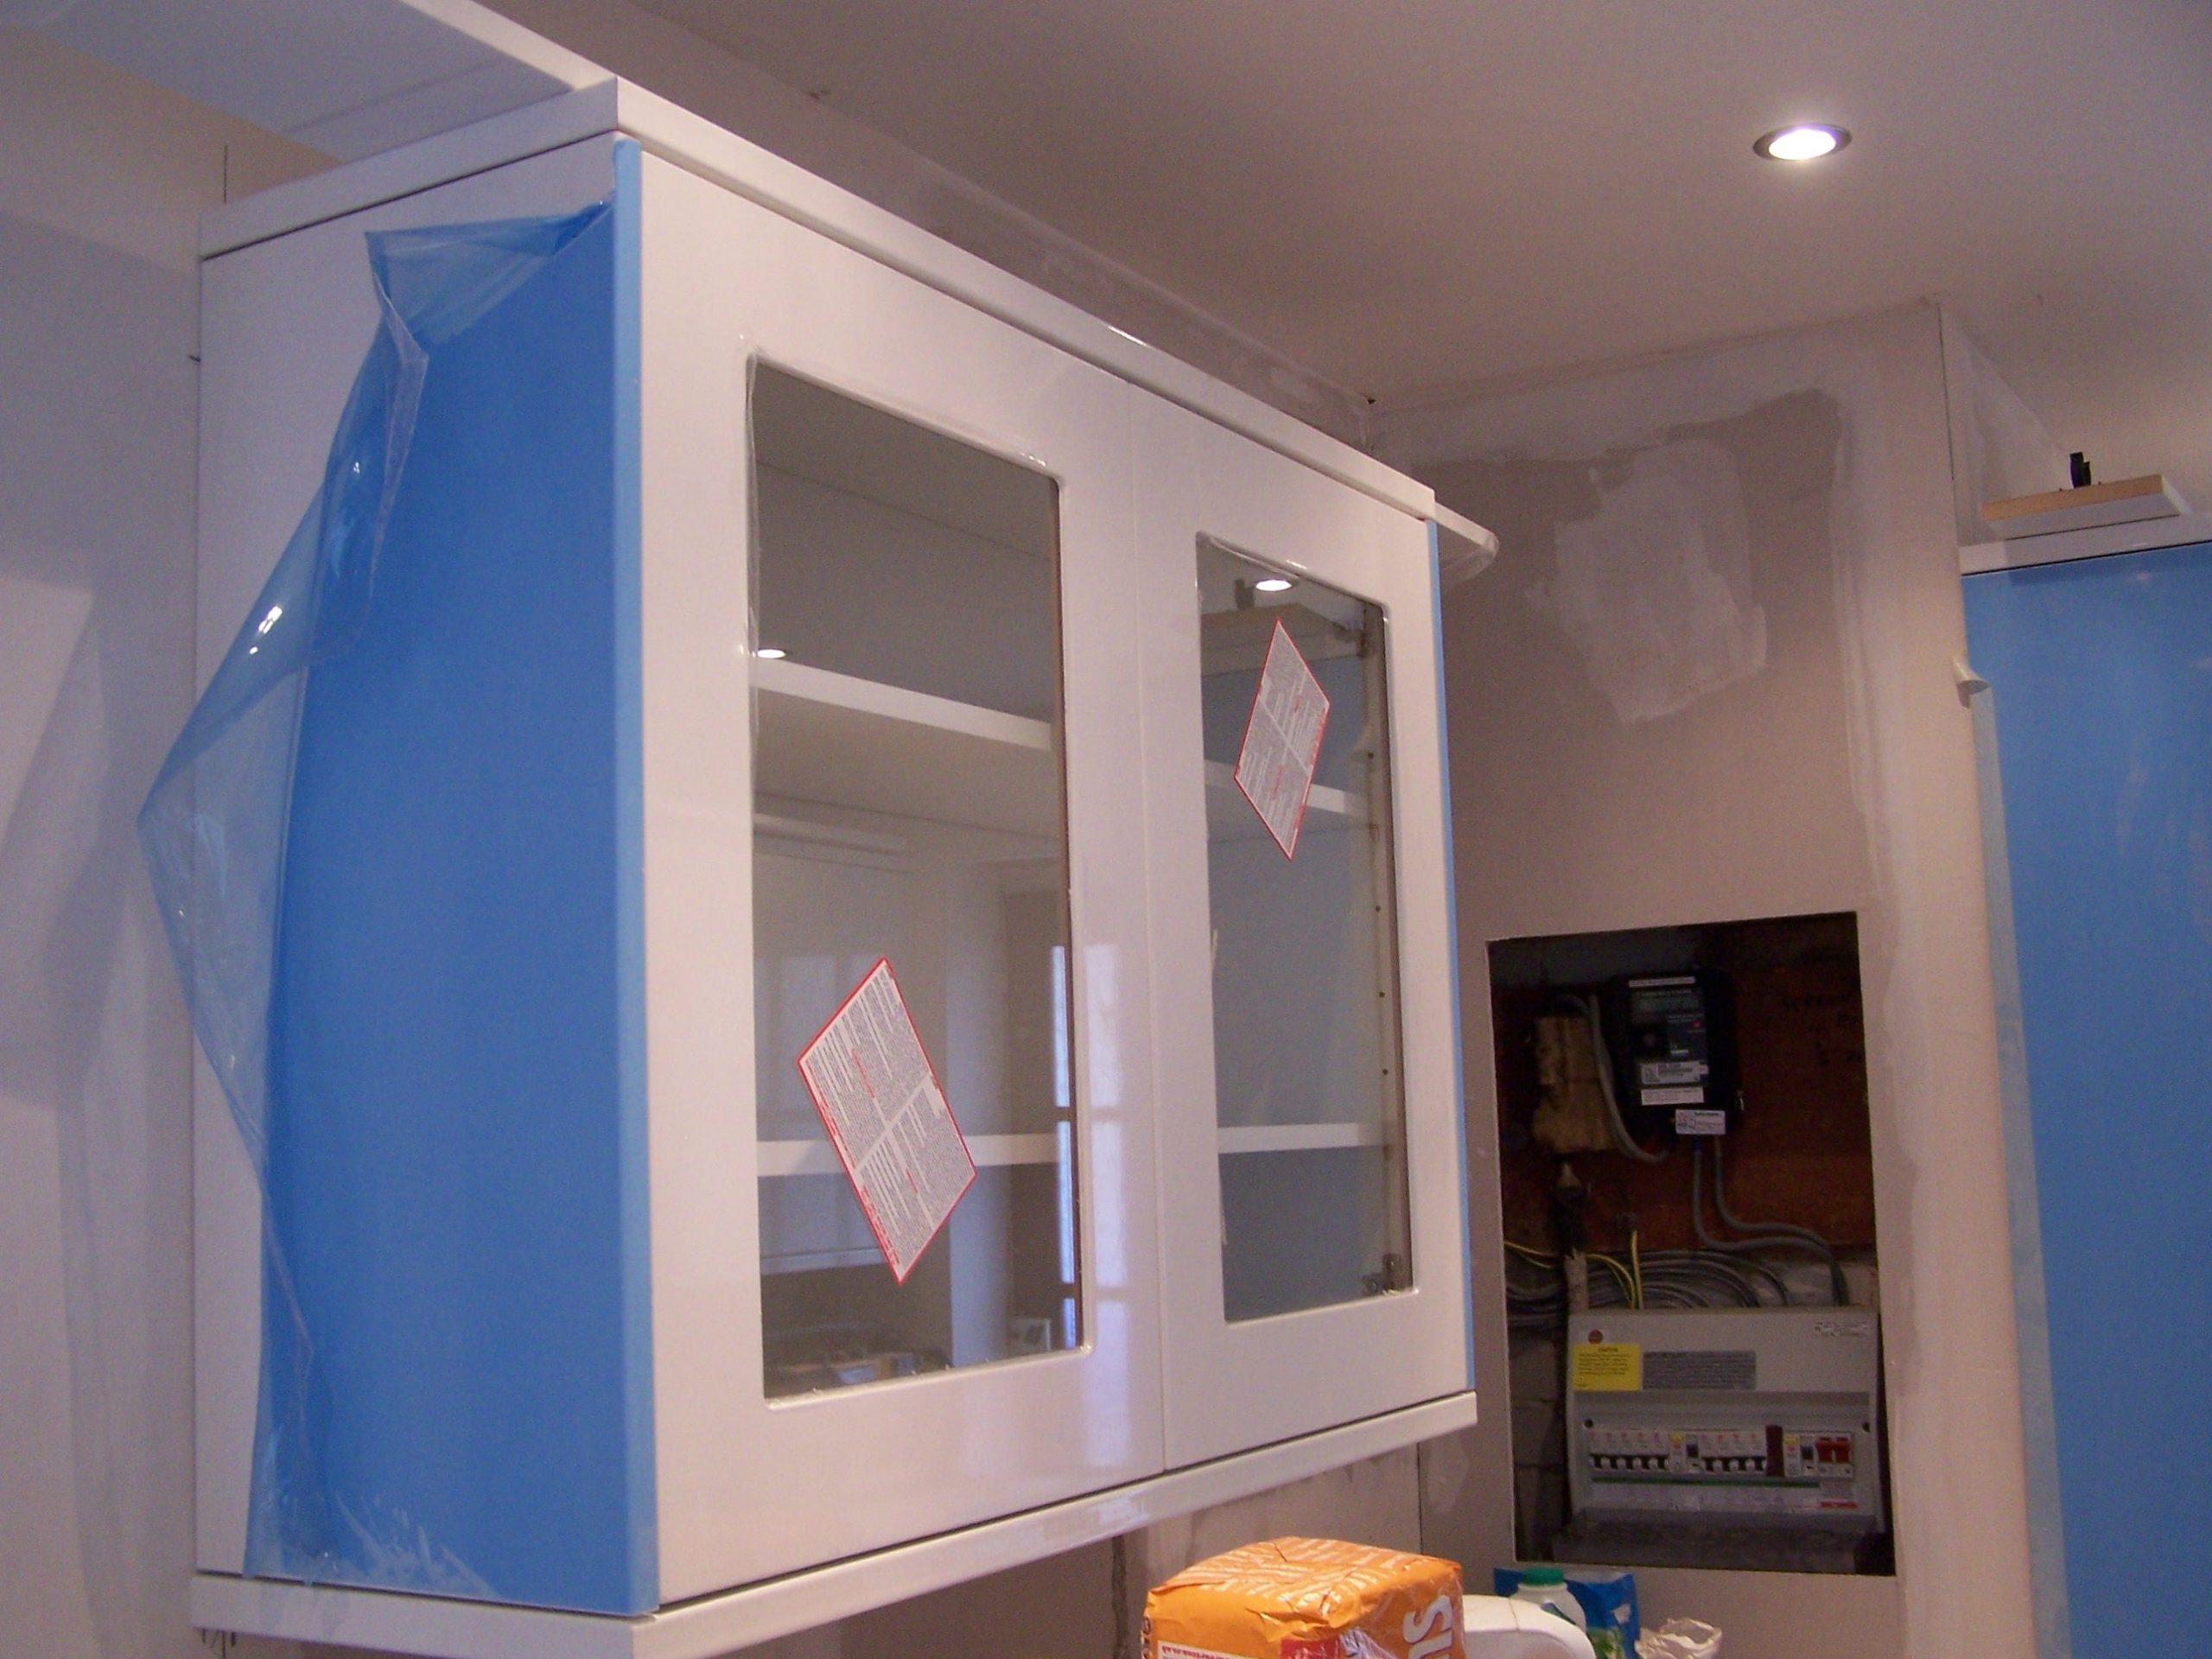 glass door, wall cabinets